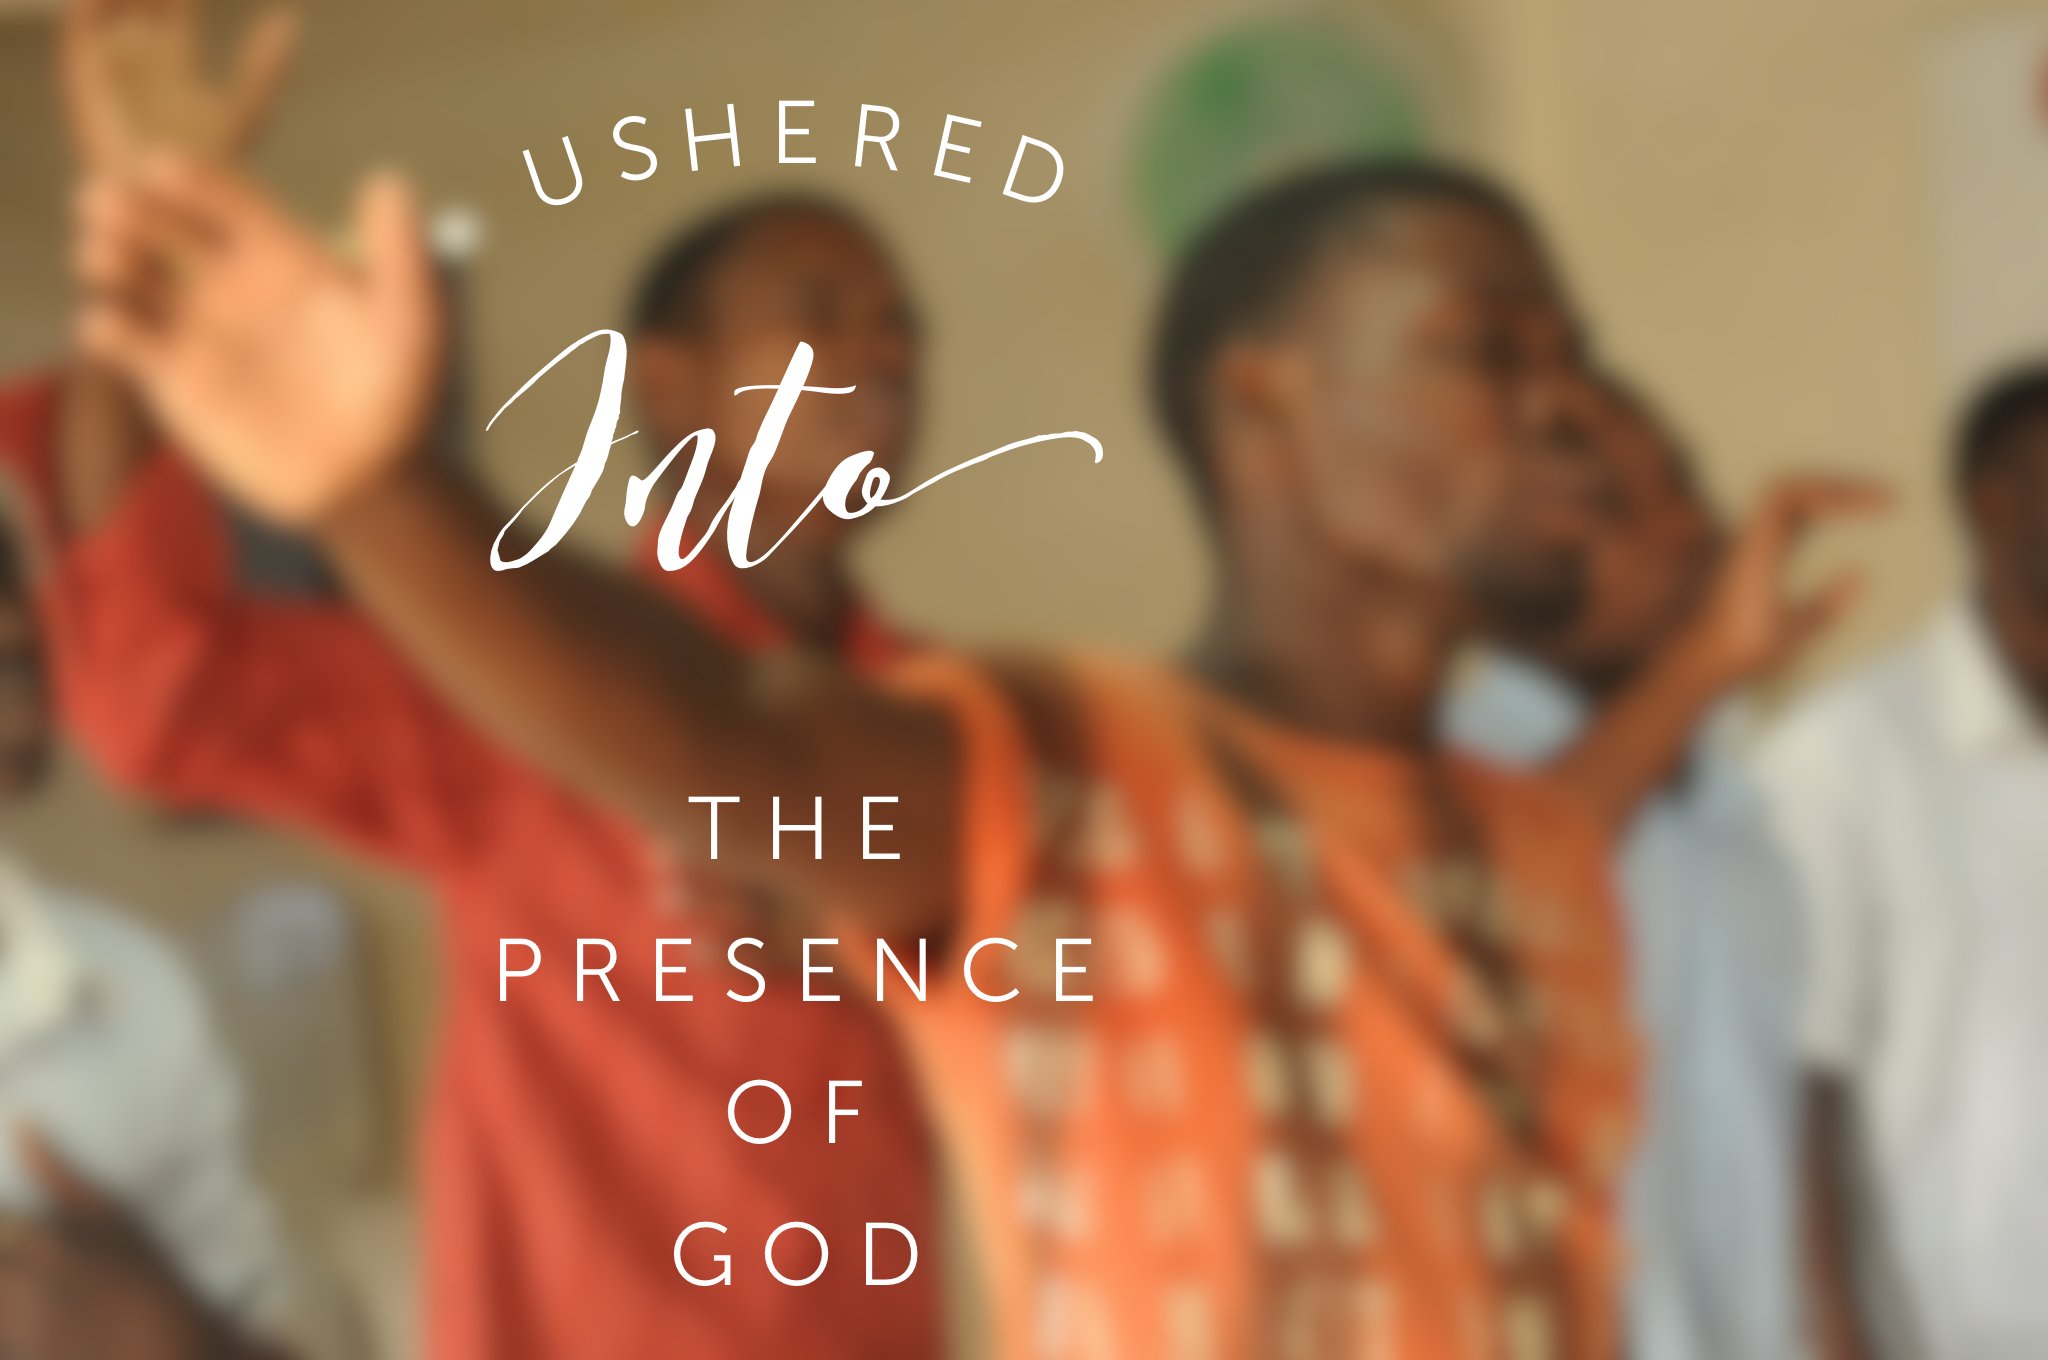 USHERED INTO THE PRESENCE OF GOD